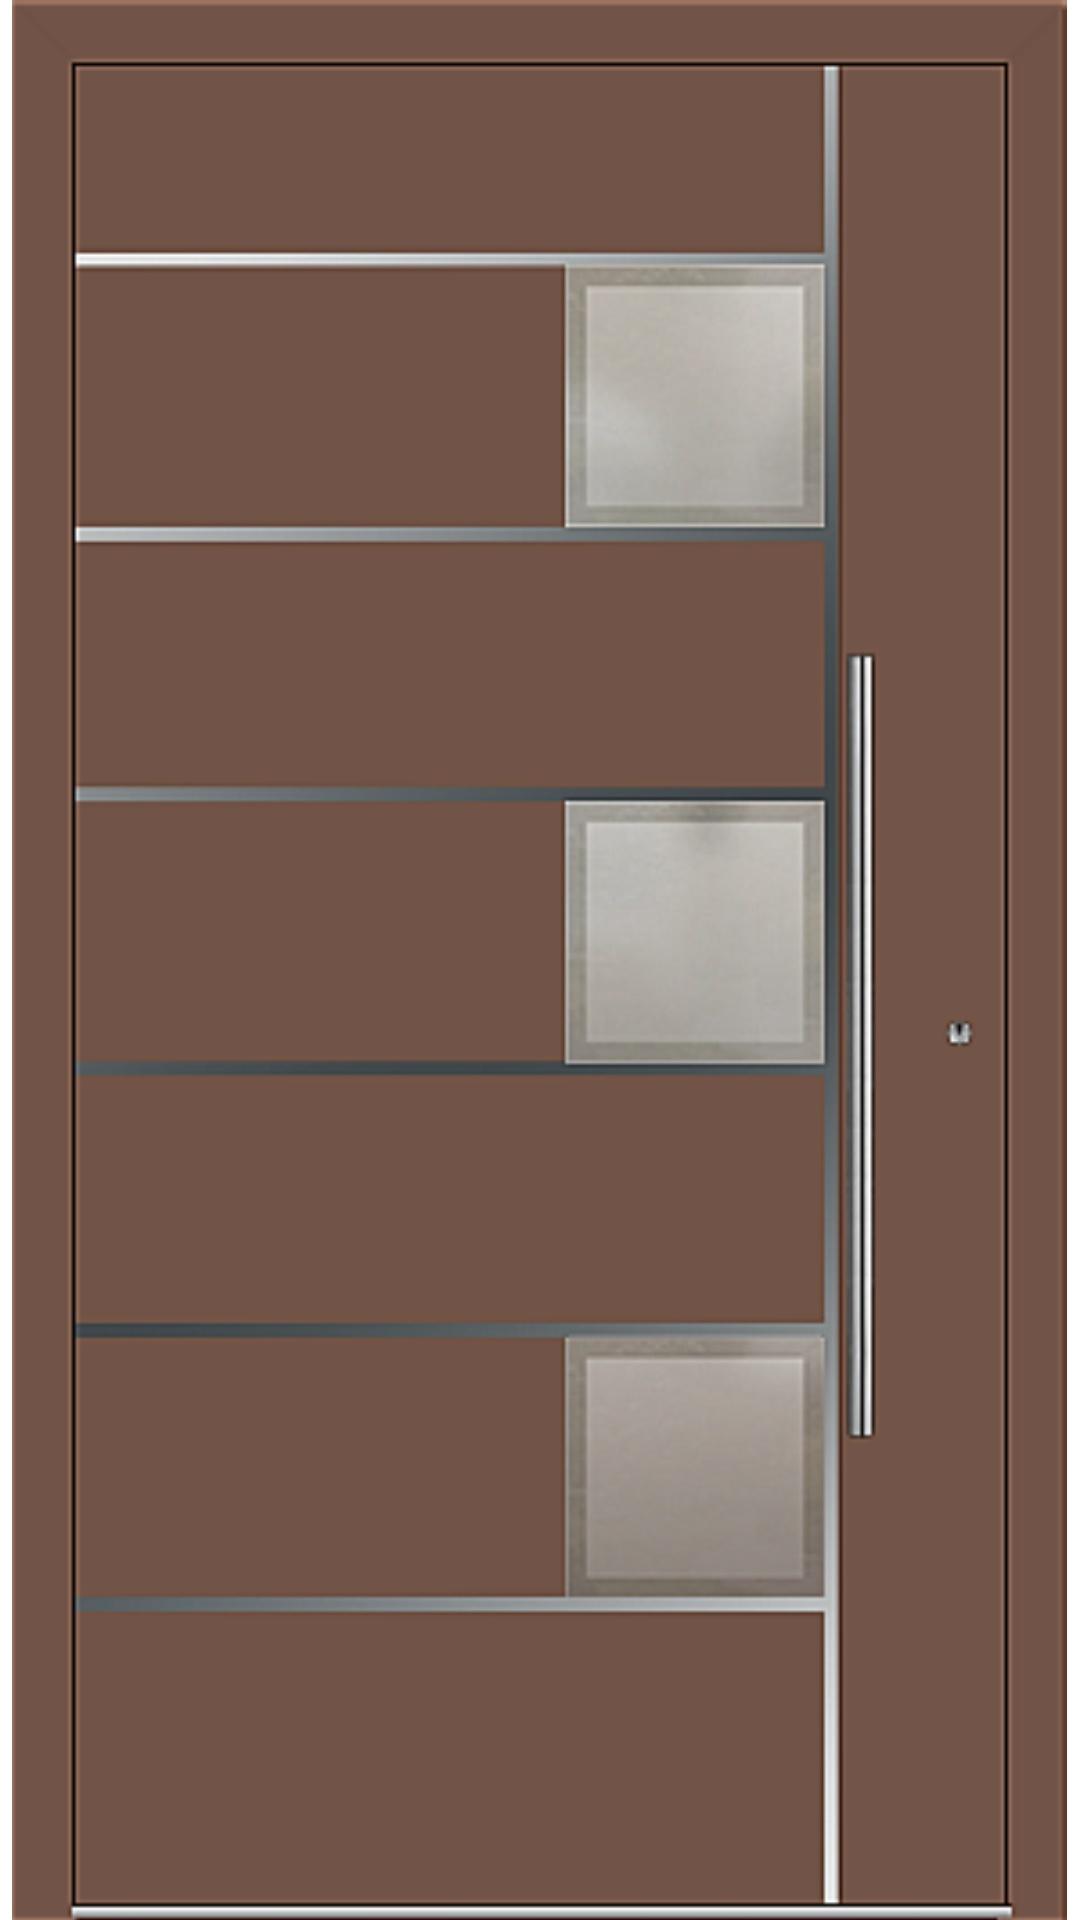 PaXentrée Aluminium Haustür M04342 lehmbraun